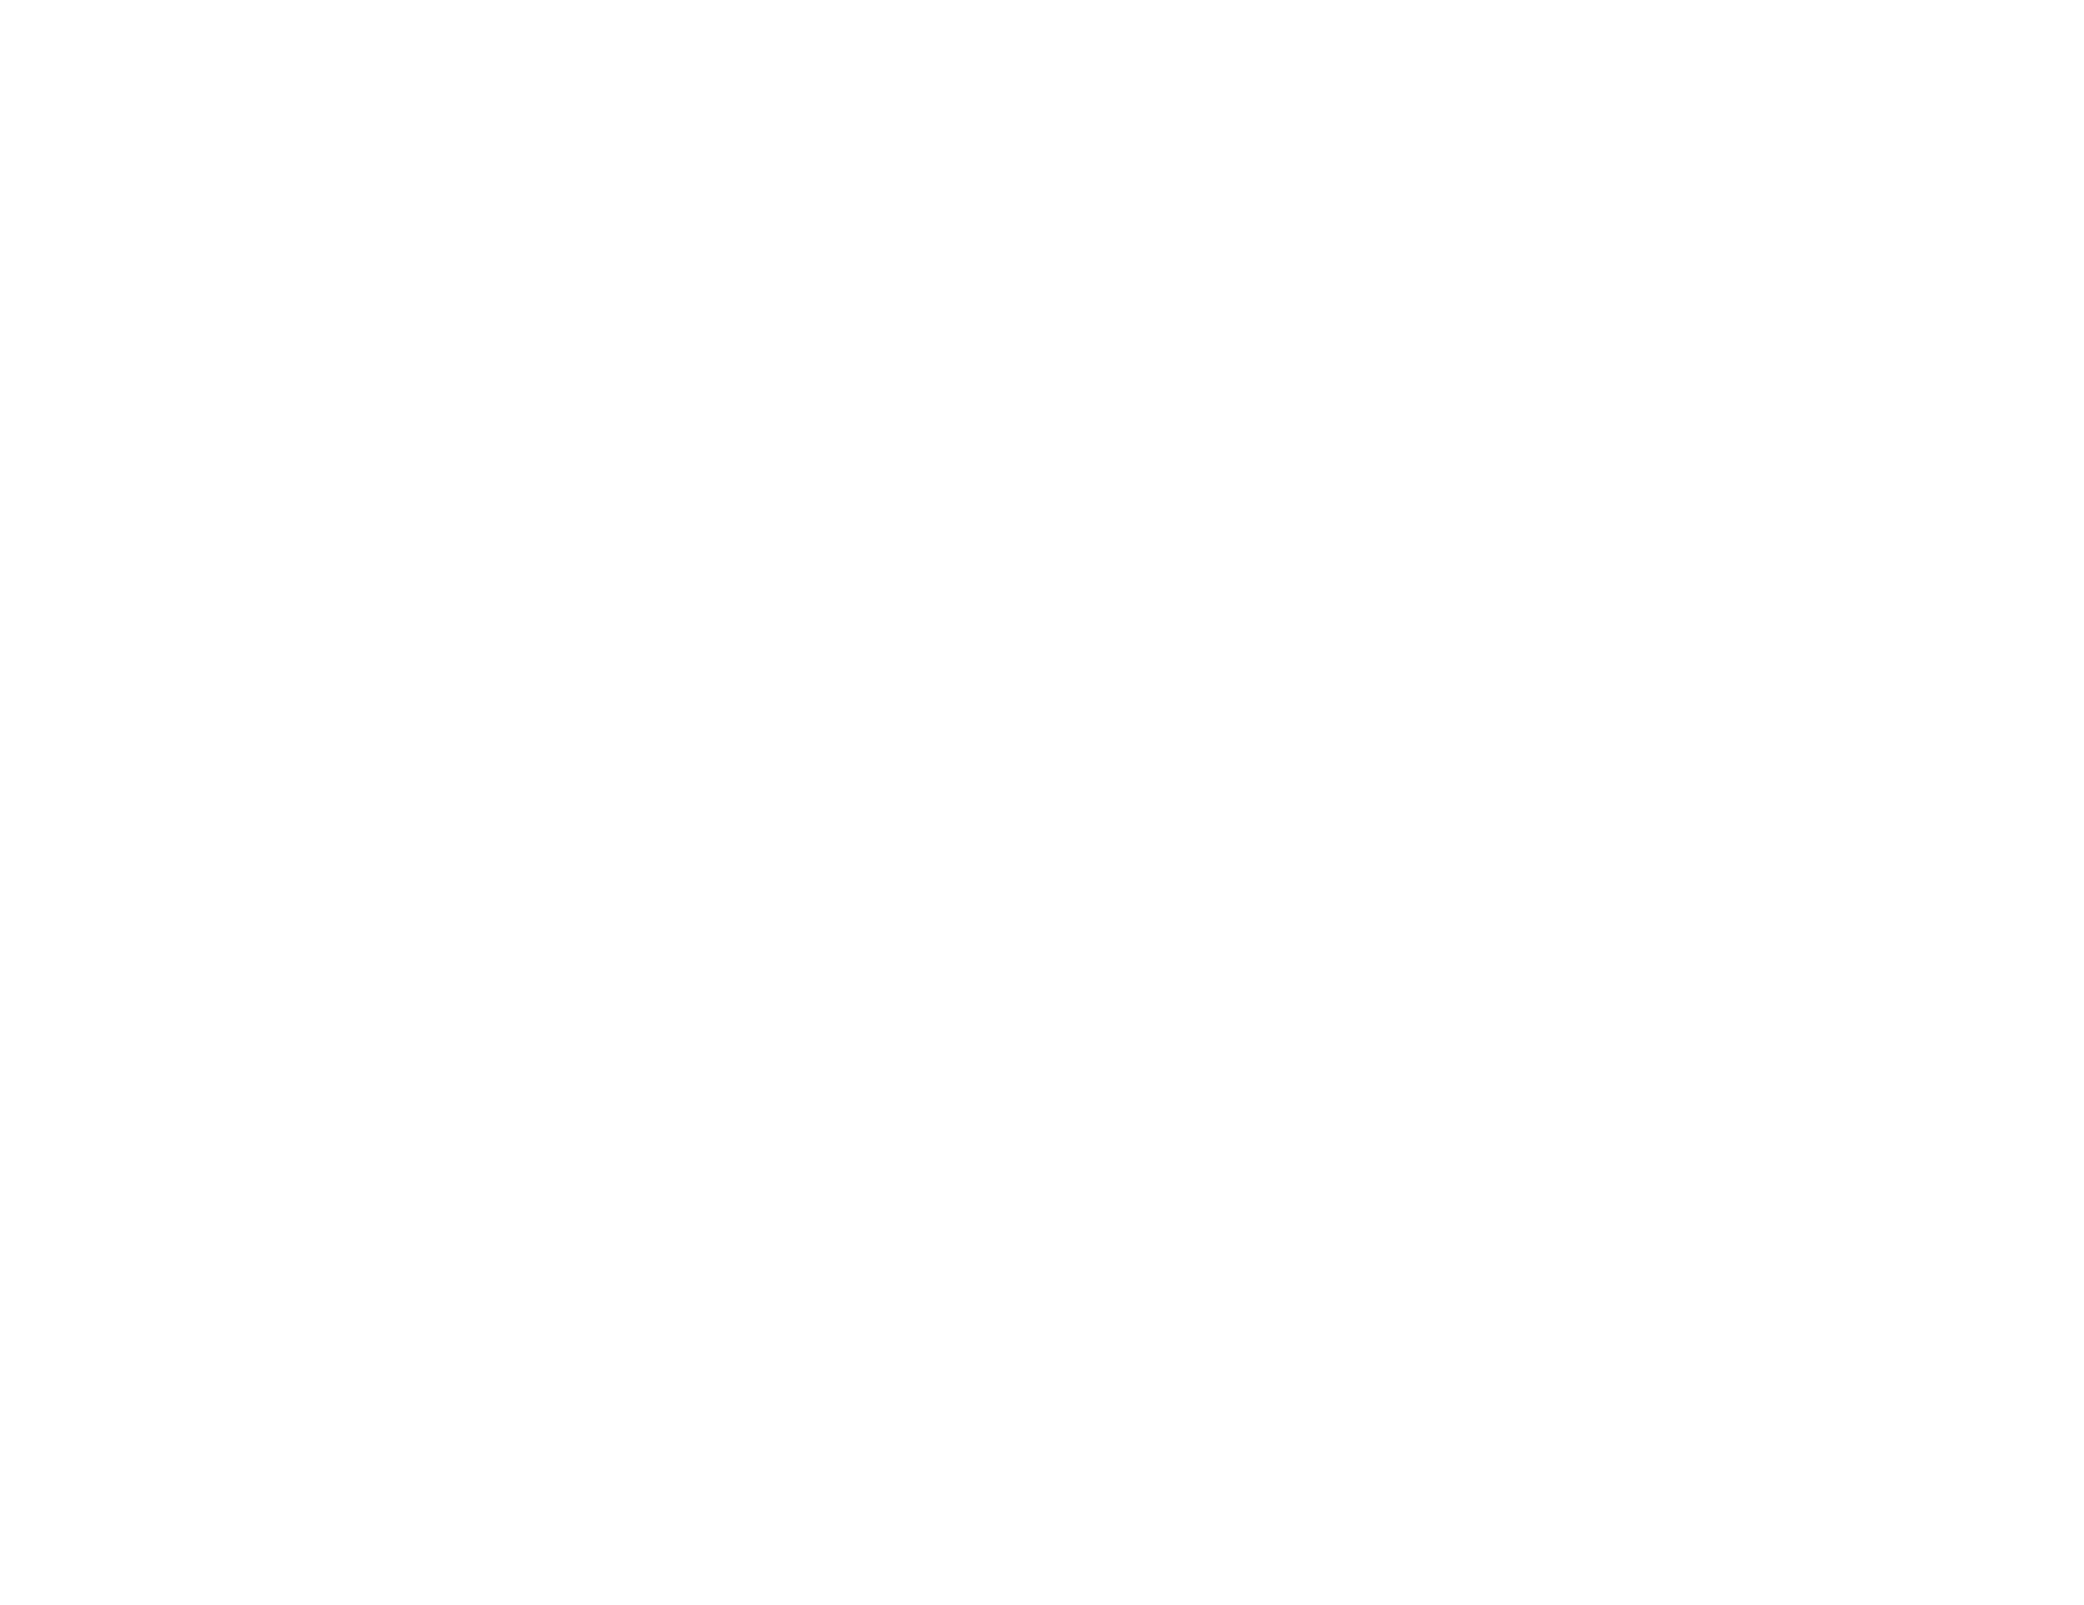 lucaspp-01.png